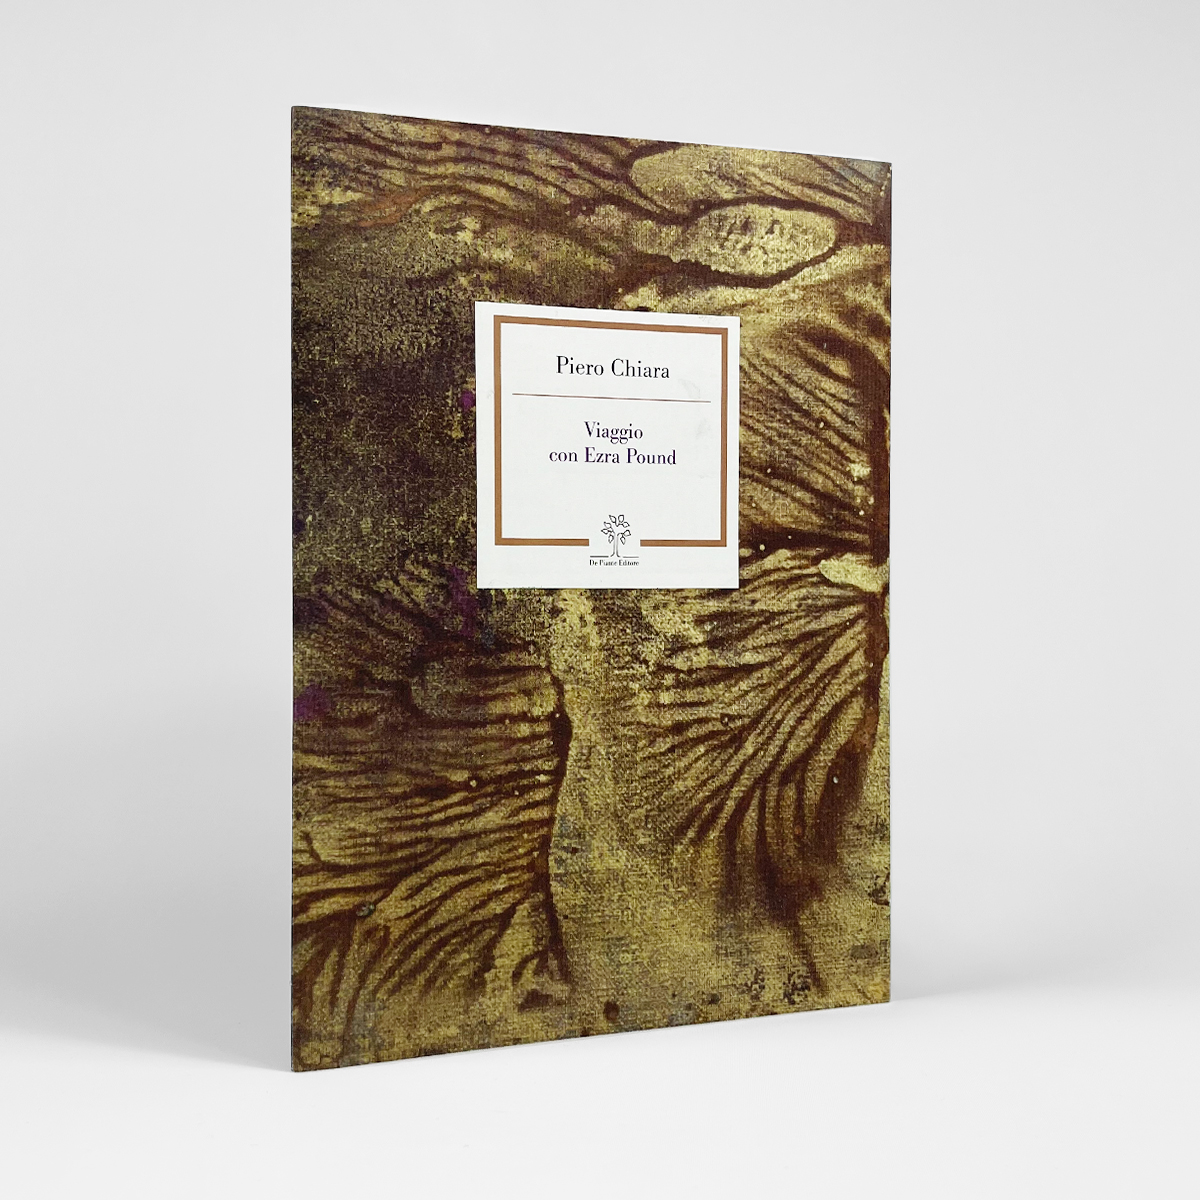 Piero Chiara - Viaggio con Ezra Pound